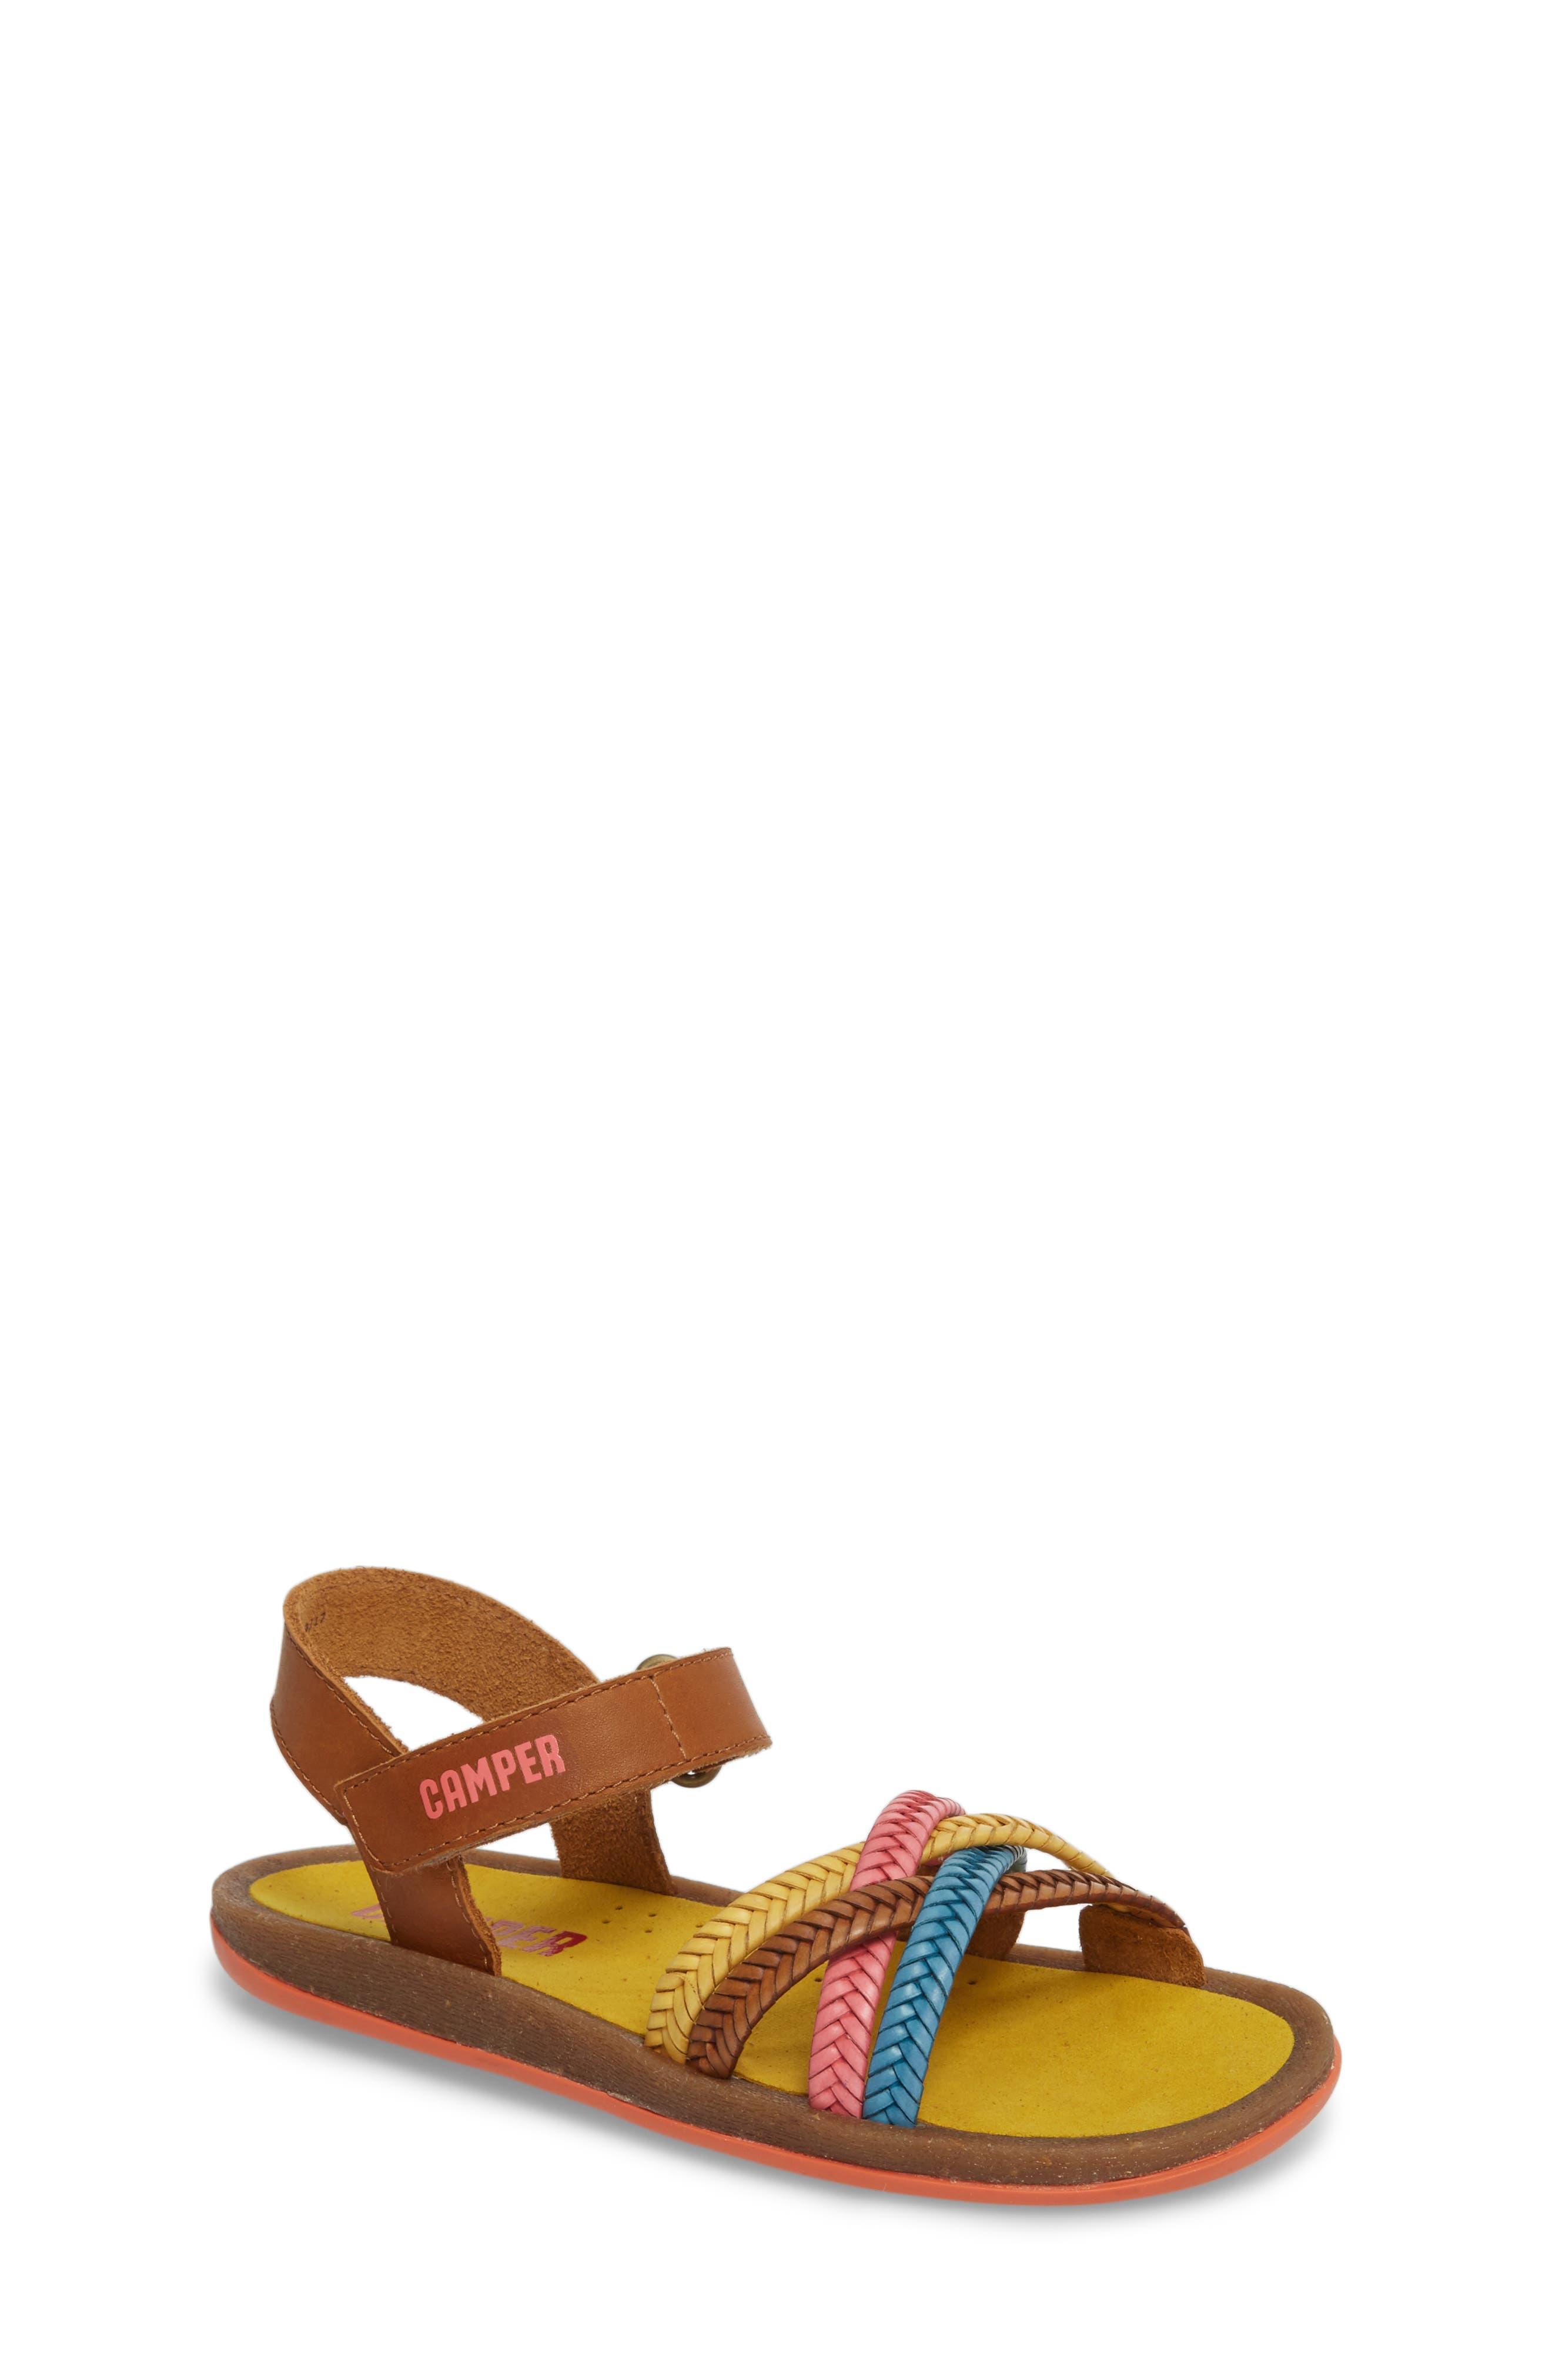 Bicho Braided Sandal,                             Main thumbnail 1, color,                             MULTI